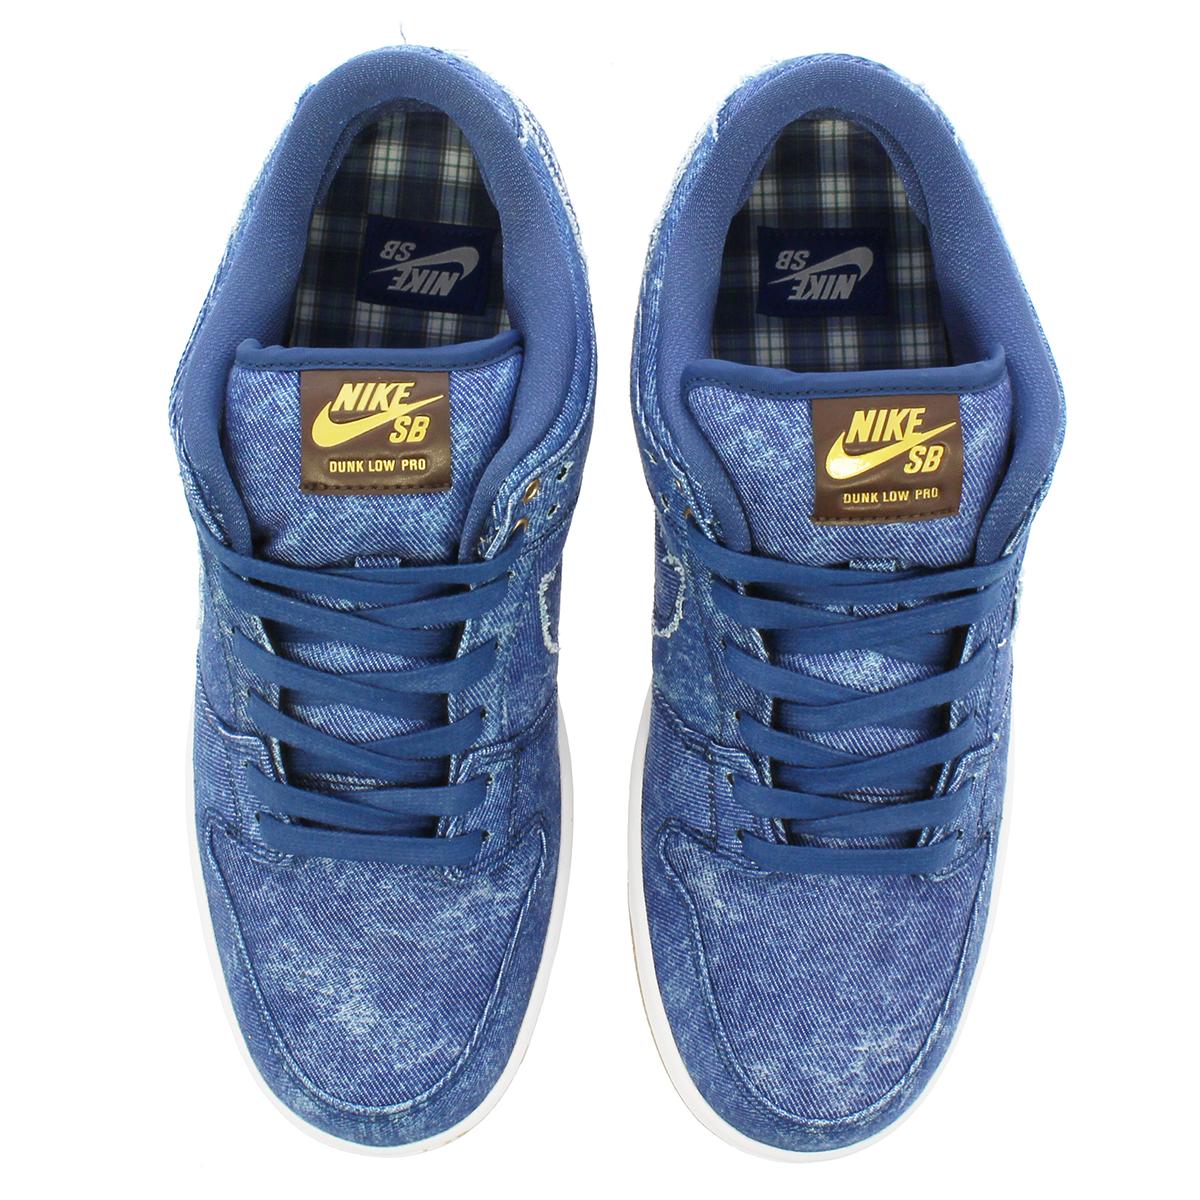 huge selection of 643c5 1e67c ... NIKE SB DUNK LOW TRD QS Nike SB dunk low TRD QS UTILITY BLUE/WHITE ...